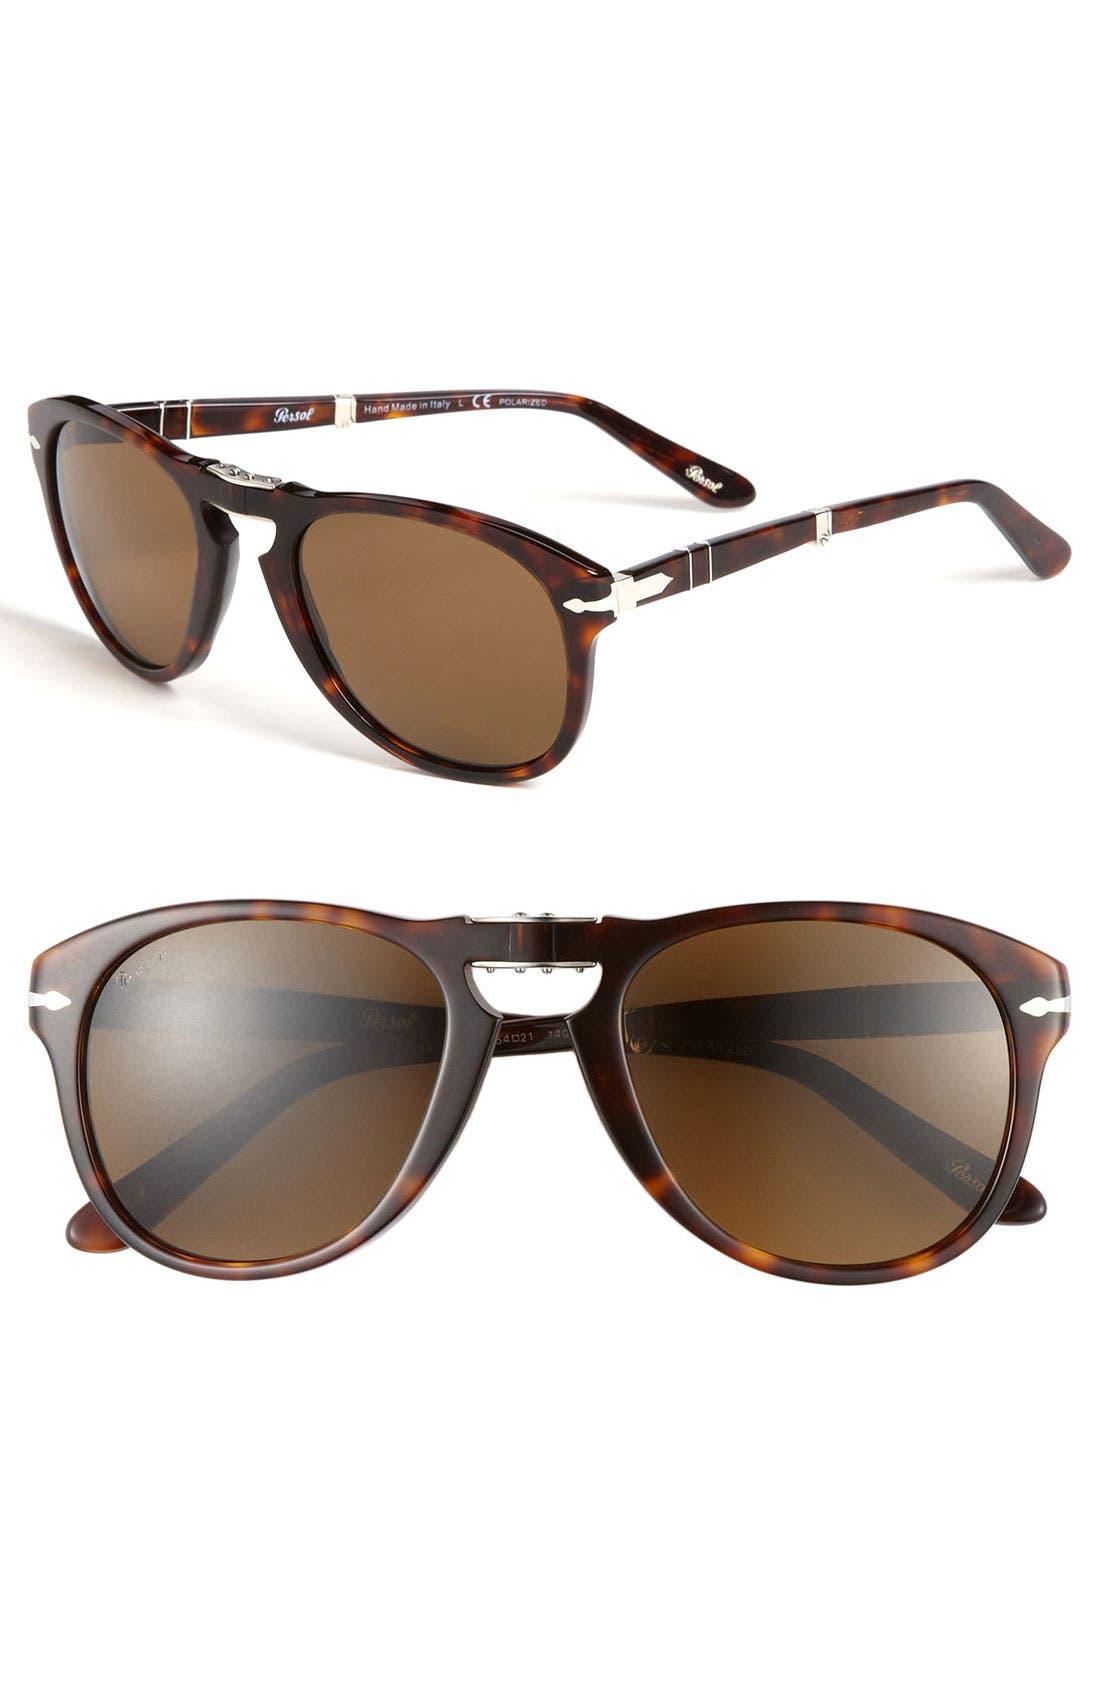 Alternate Image 1 Selected - Persol '714' 57mm Folding Polarized Keyhole Sunglasses